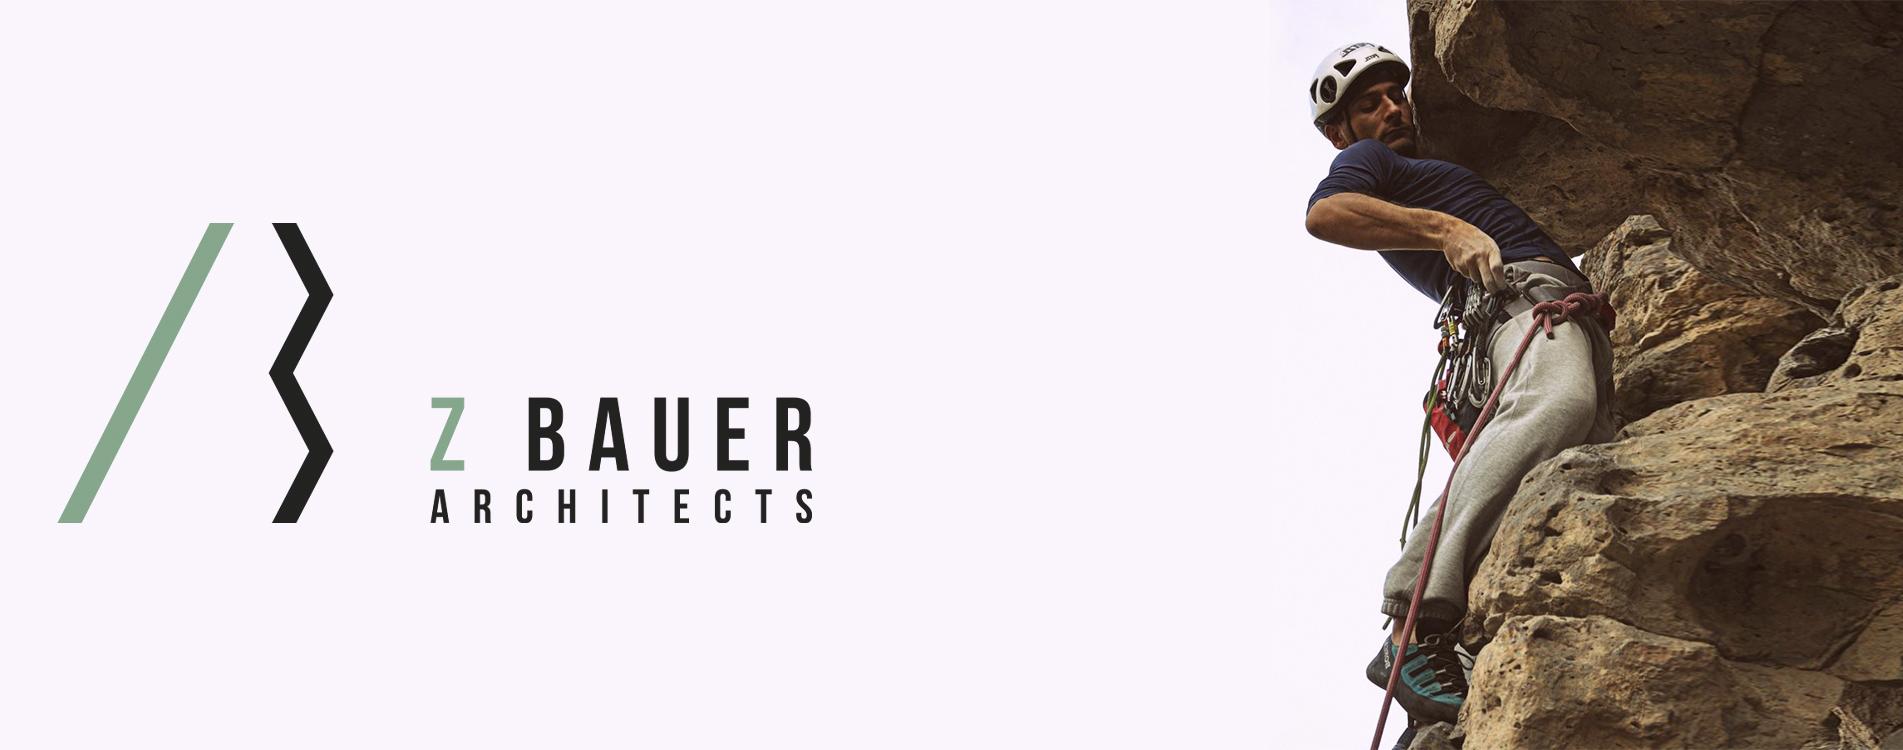 Zohrab Bauer Architect Philosophy Nature 8